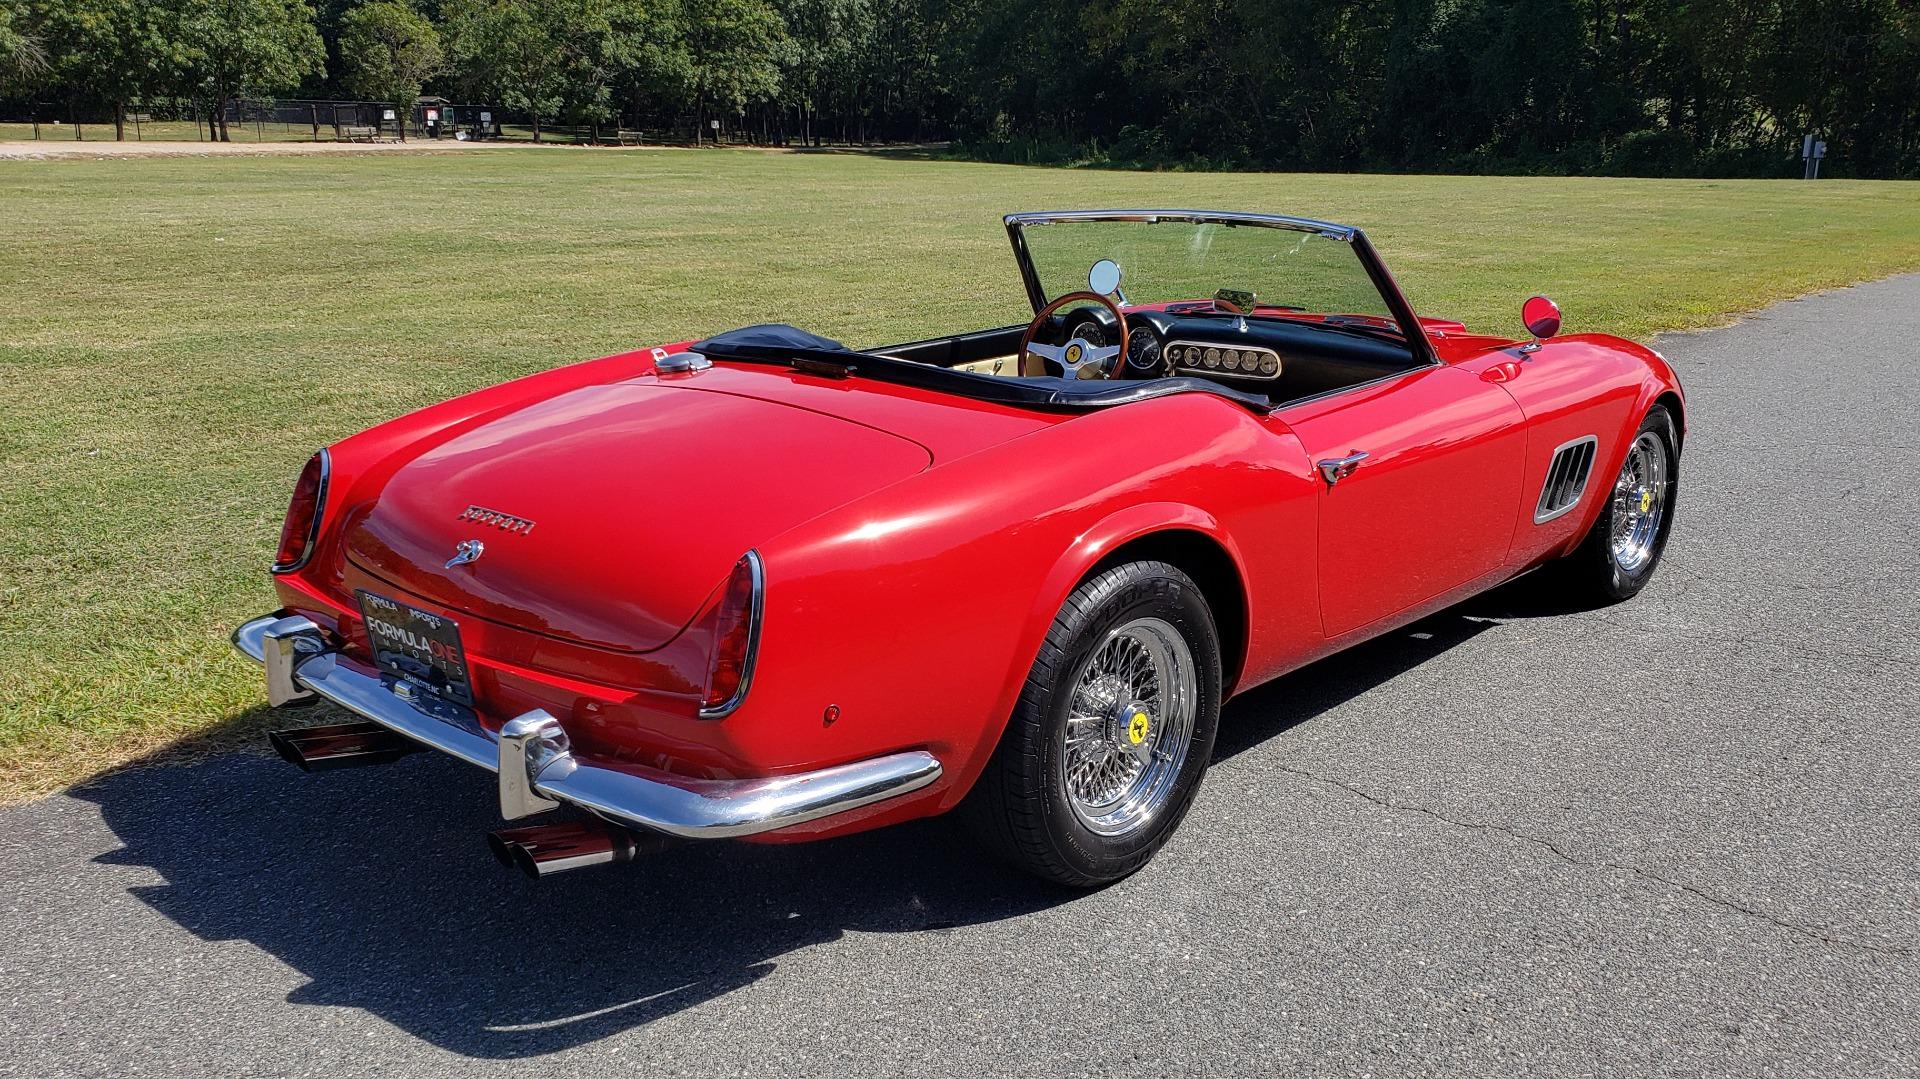 Used 1961 Ferrari 250GT SWB CALIFORNIA REPLICA / 302CI V8 / TREMEC 5-SPEED for sale Sold at Formula Imports in Charlotte NC 28227 23